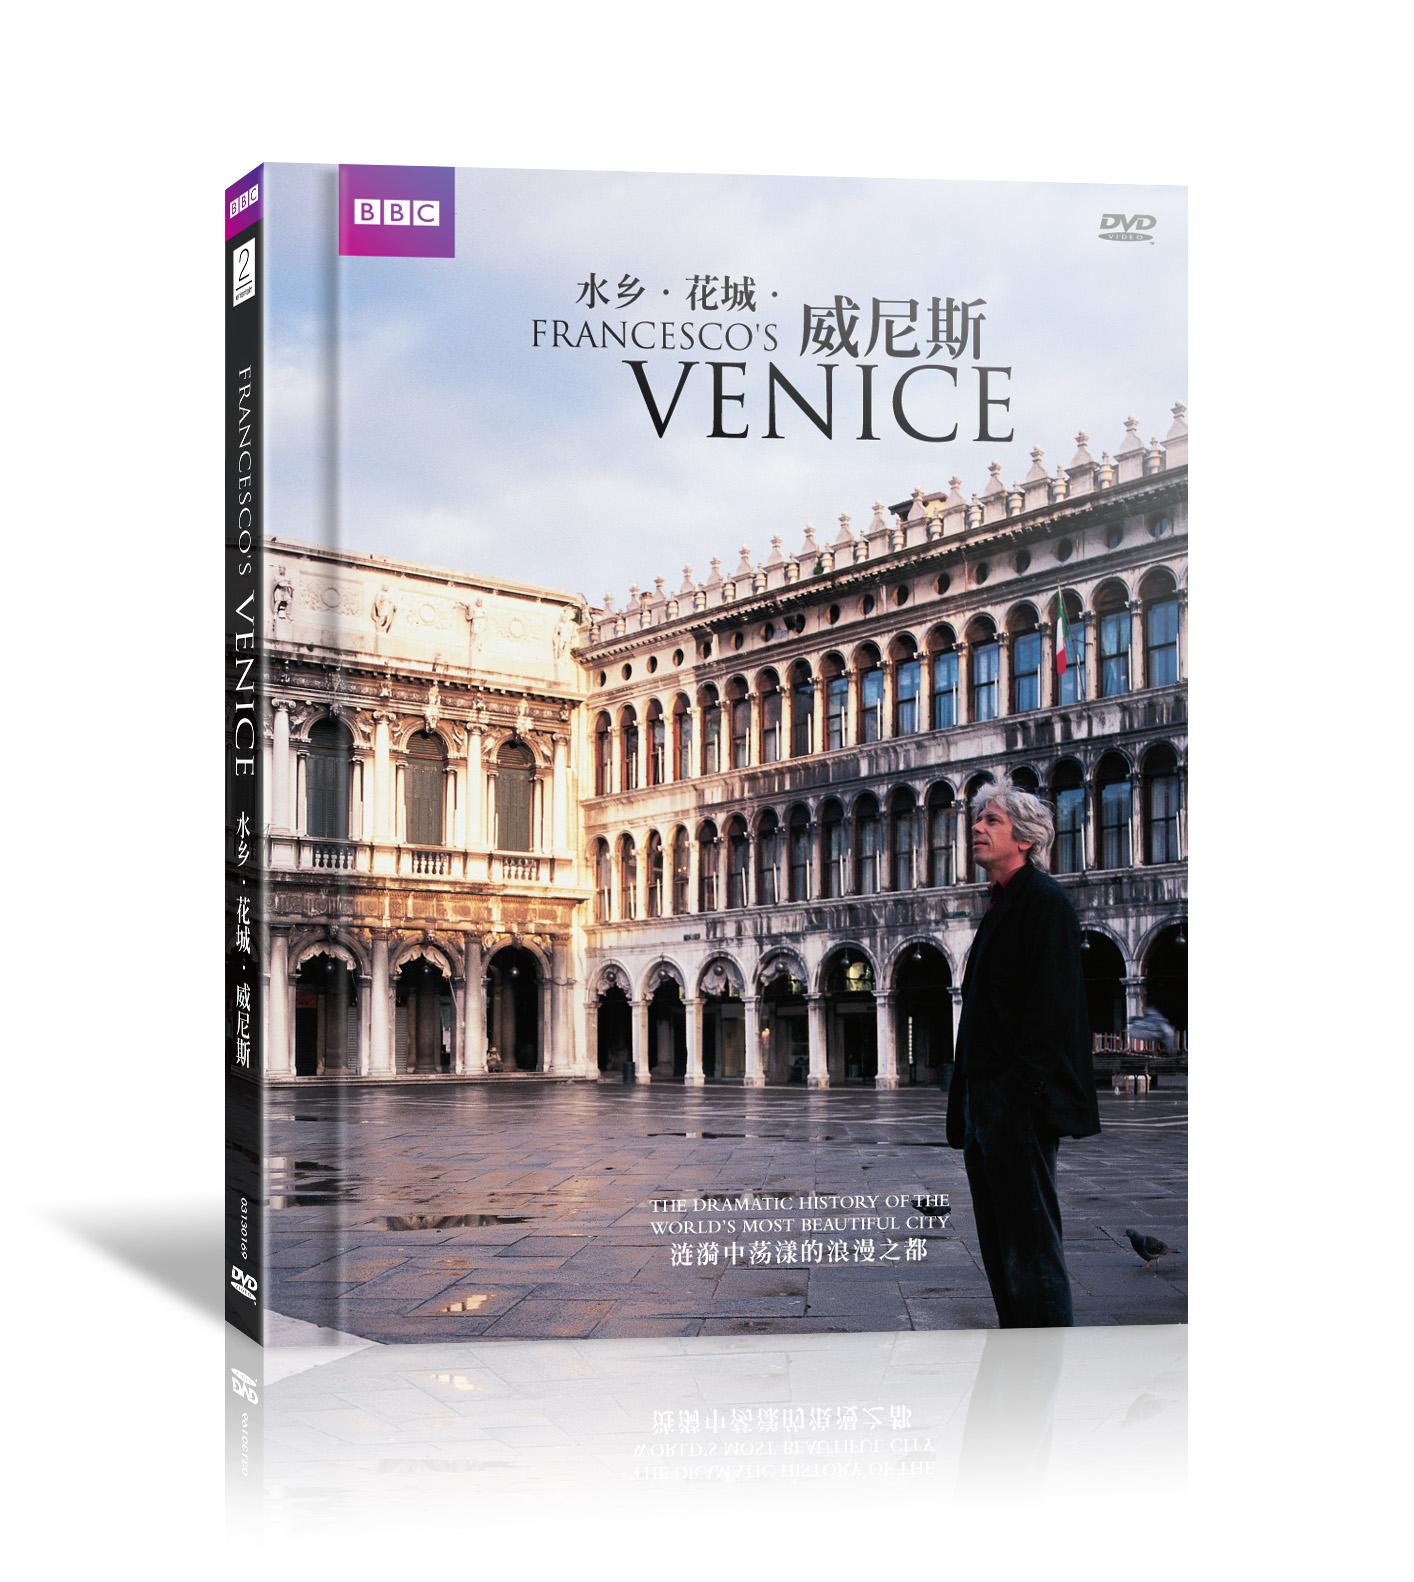 BBC纪录片《水乡-花城-威尼斯》引进发行